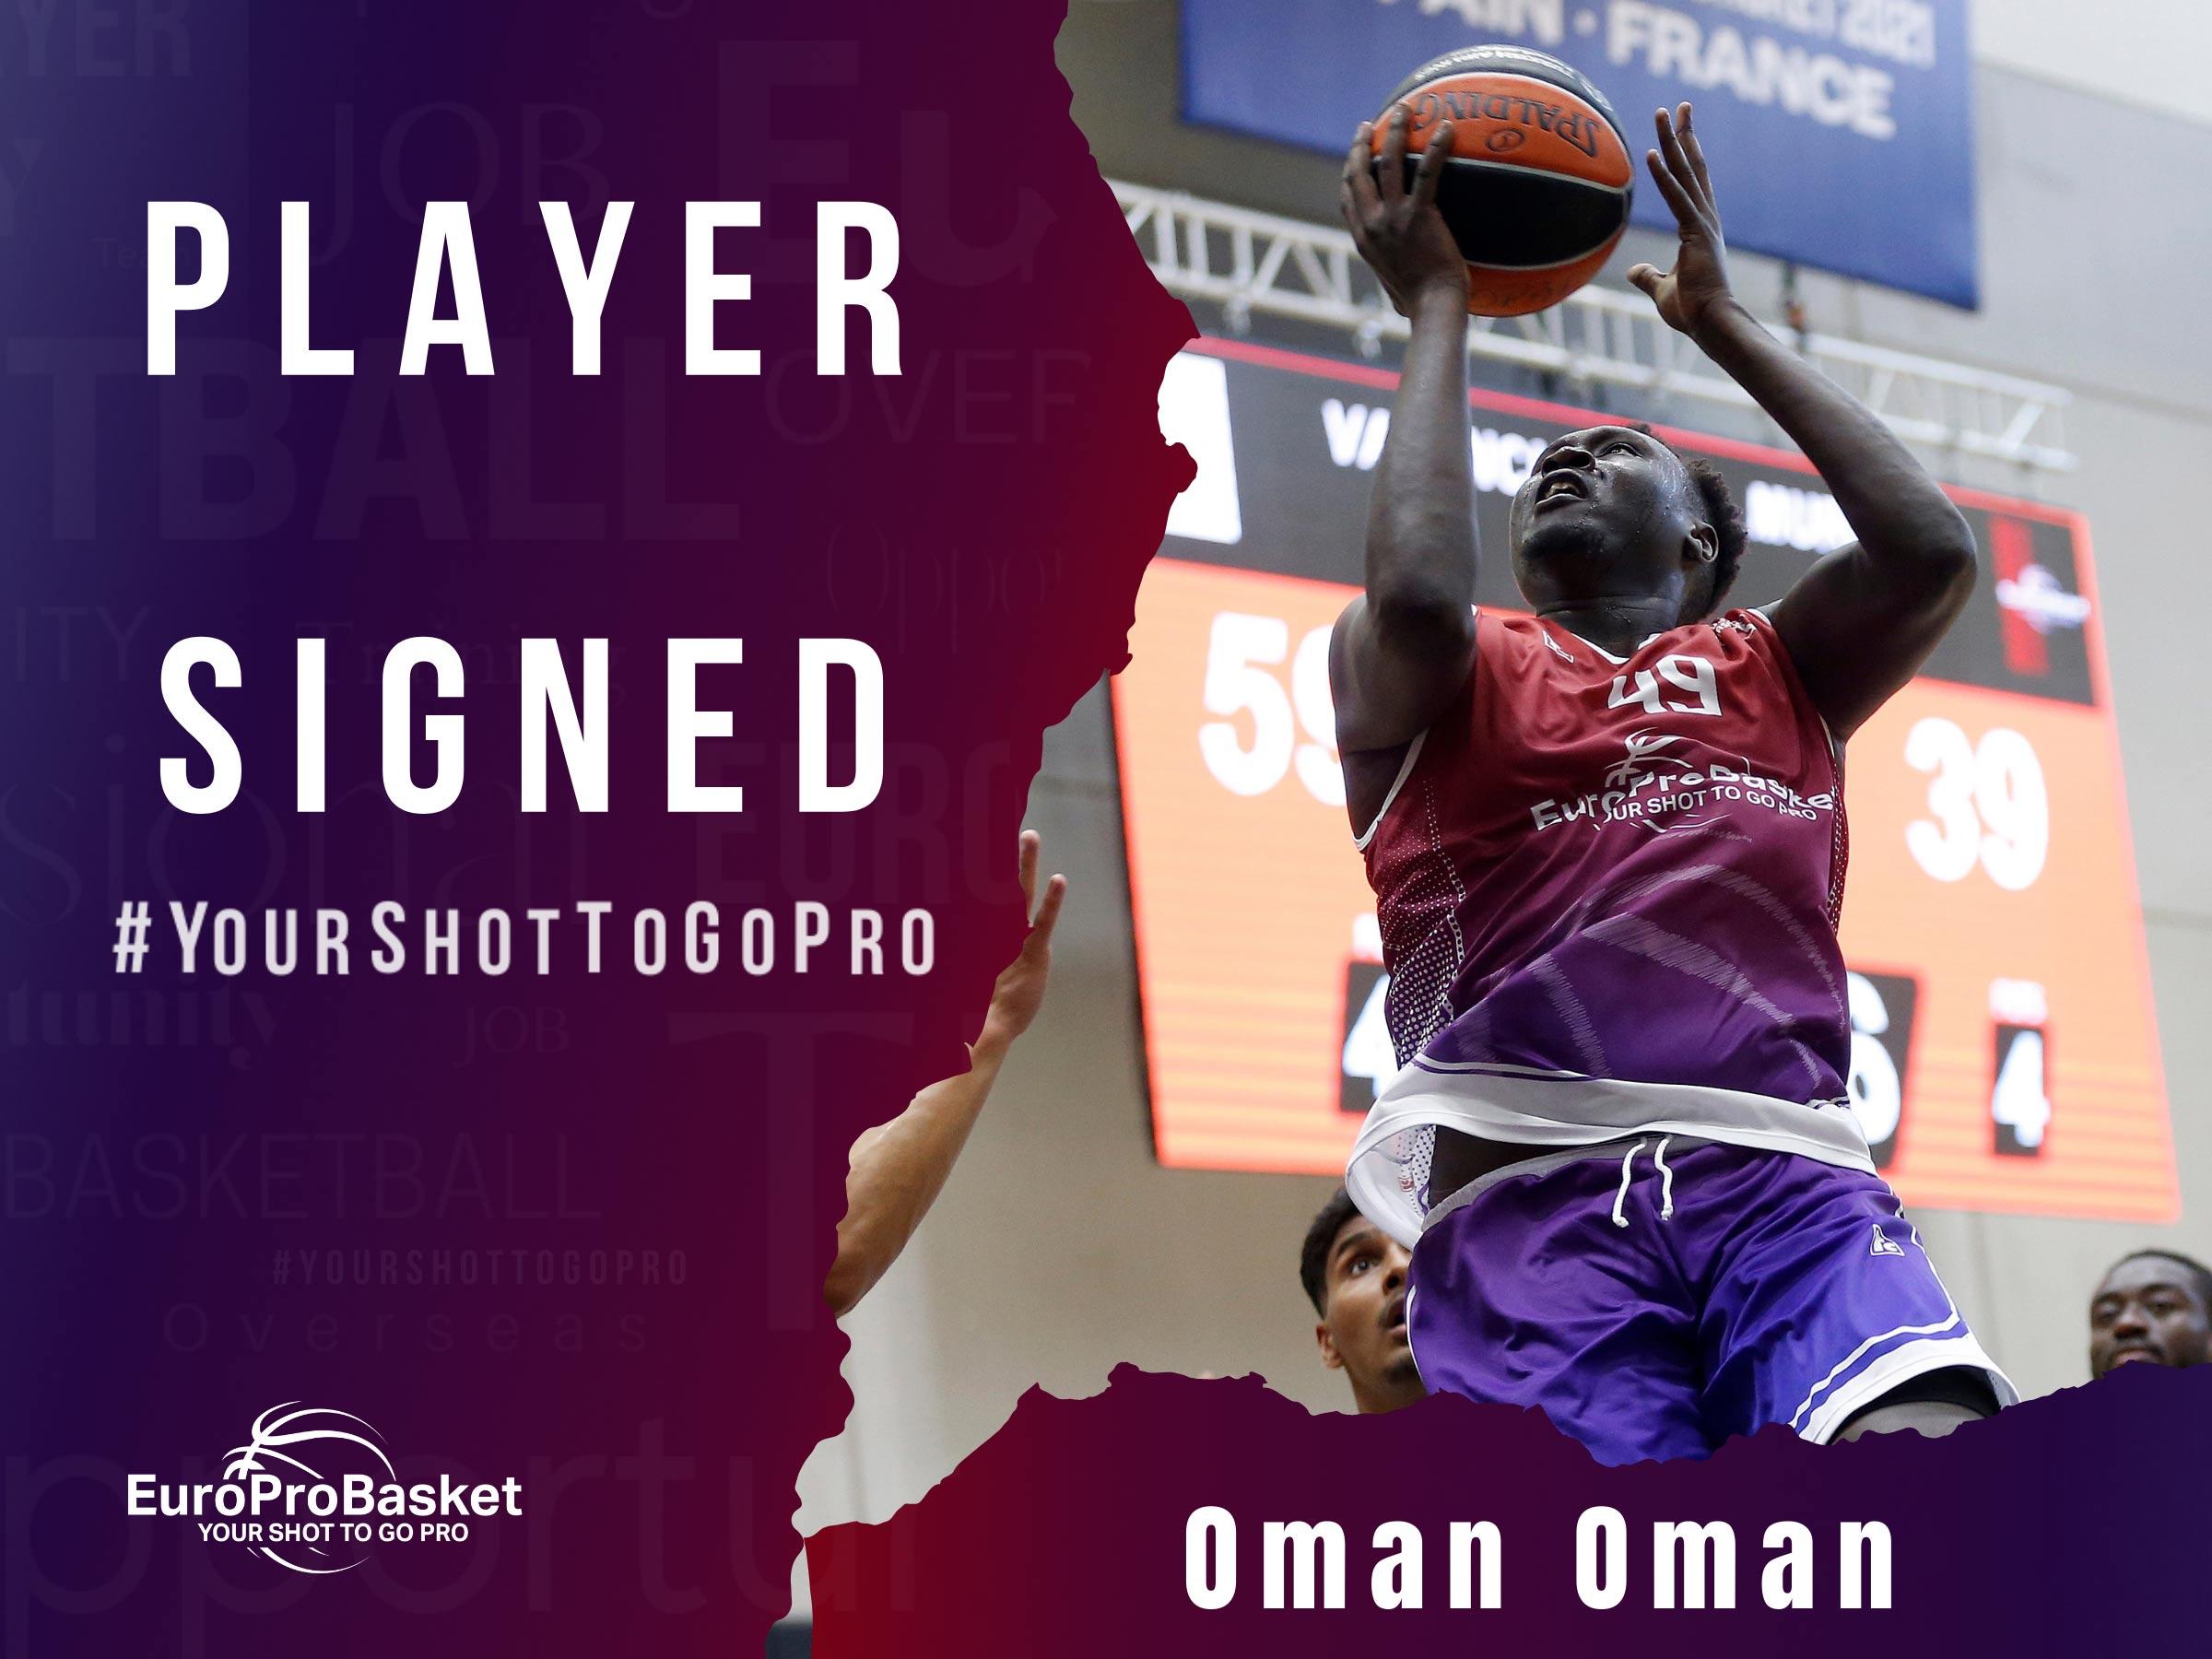 Oman Oman